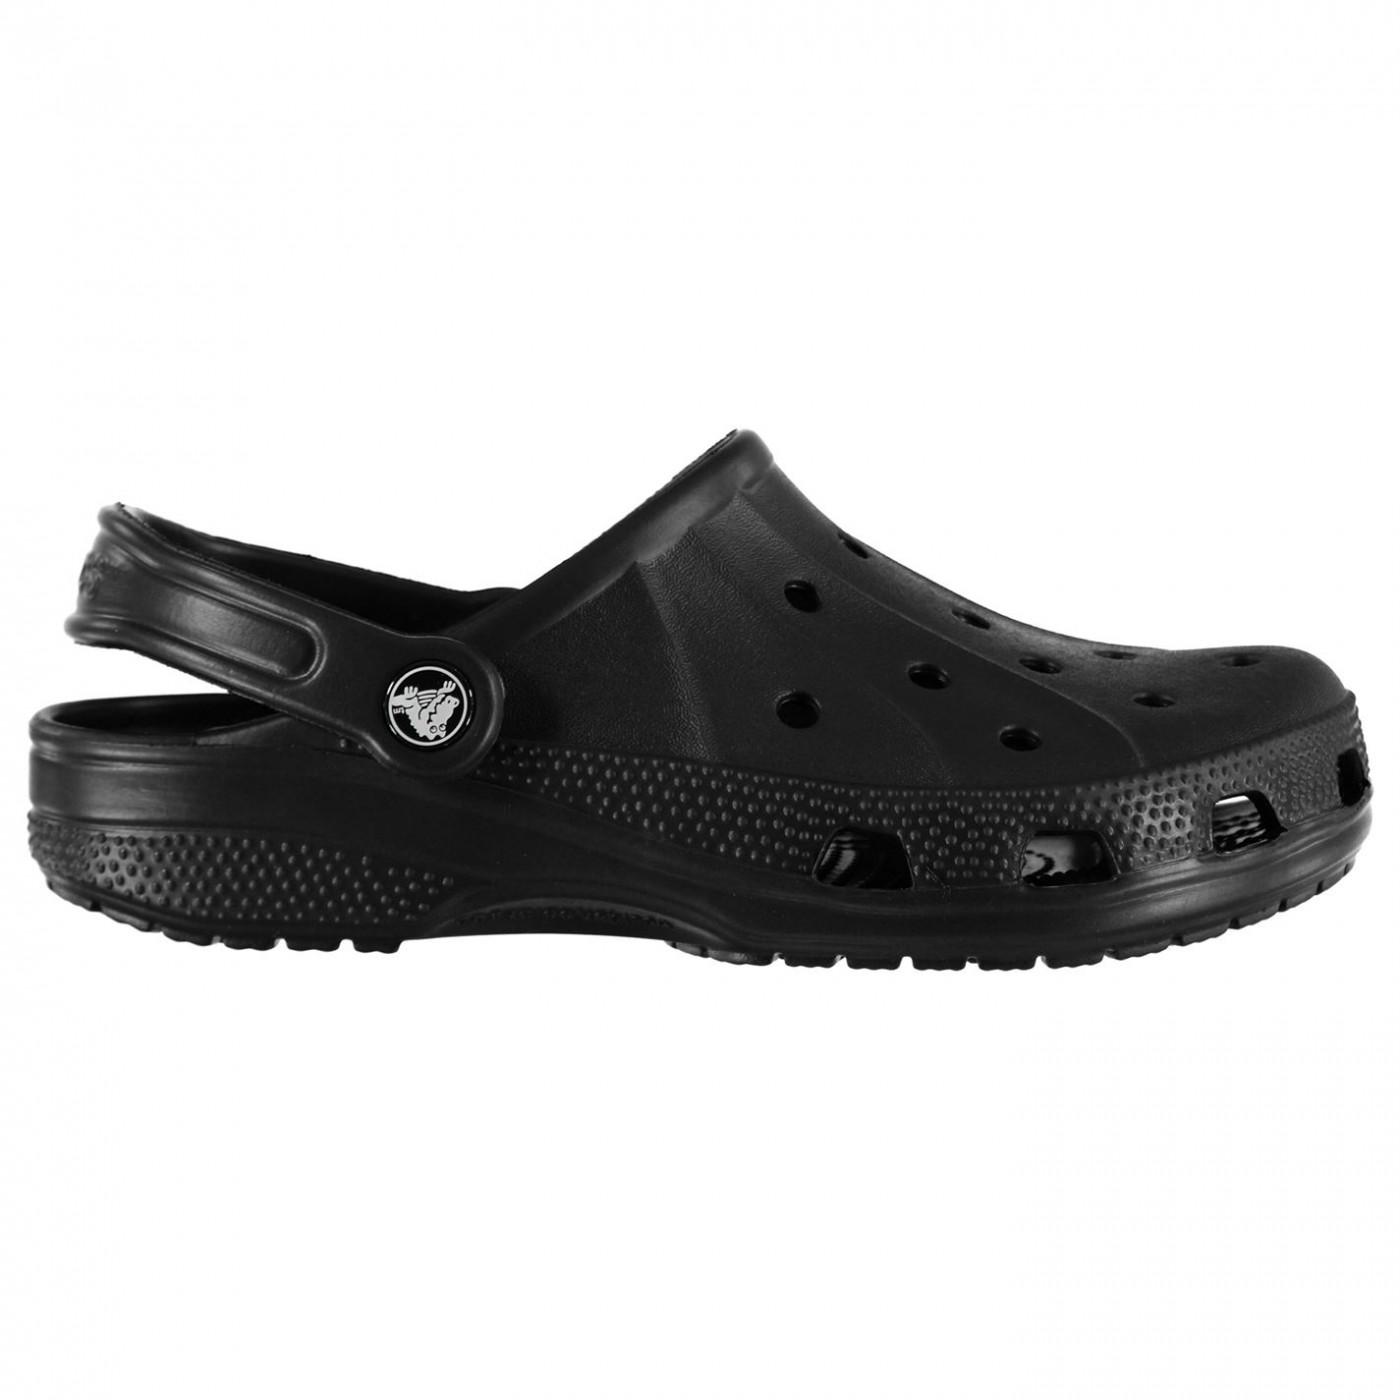 Crocs 15907 Clog C99